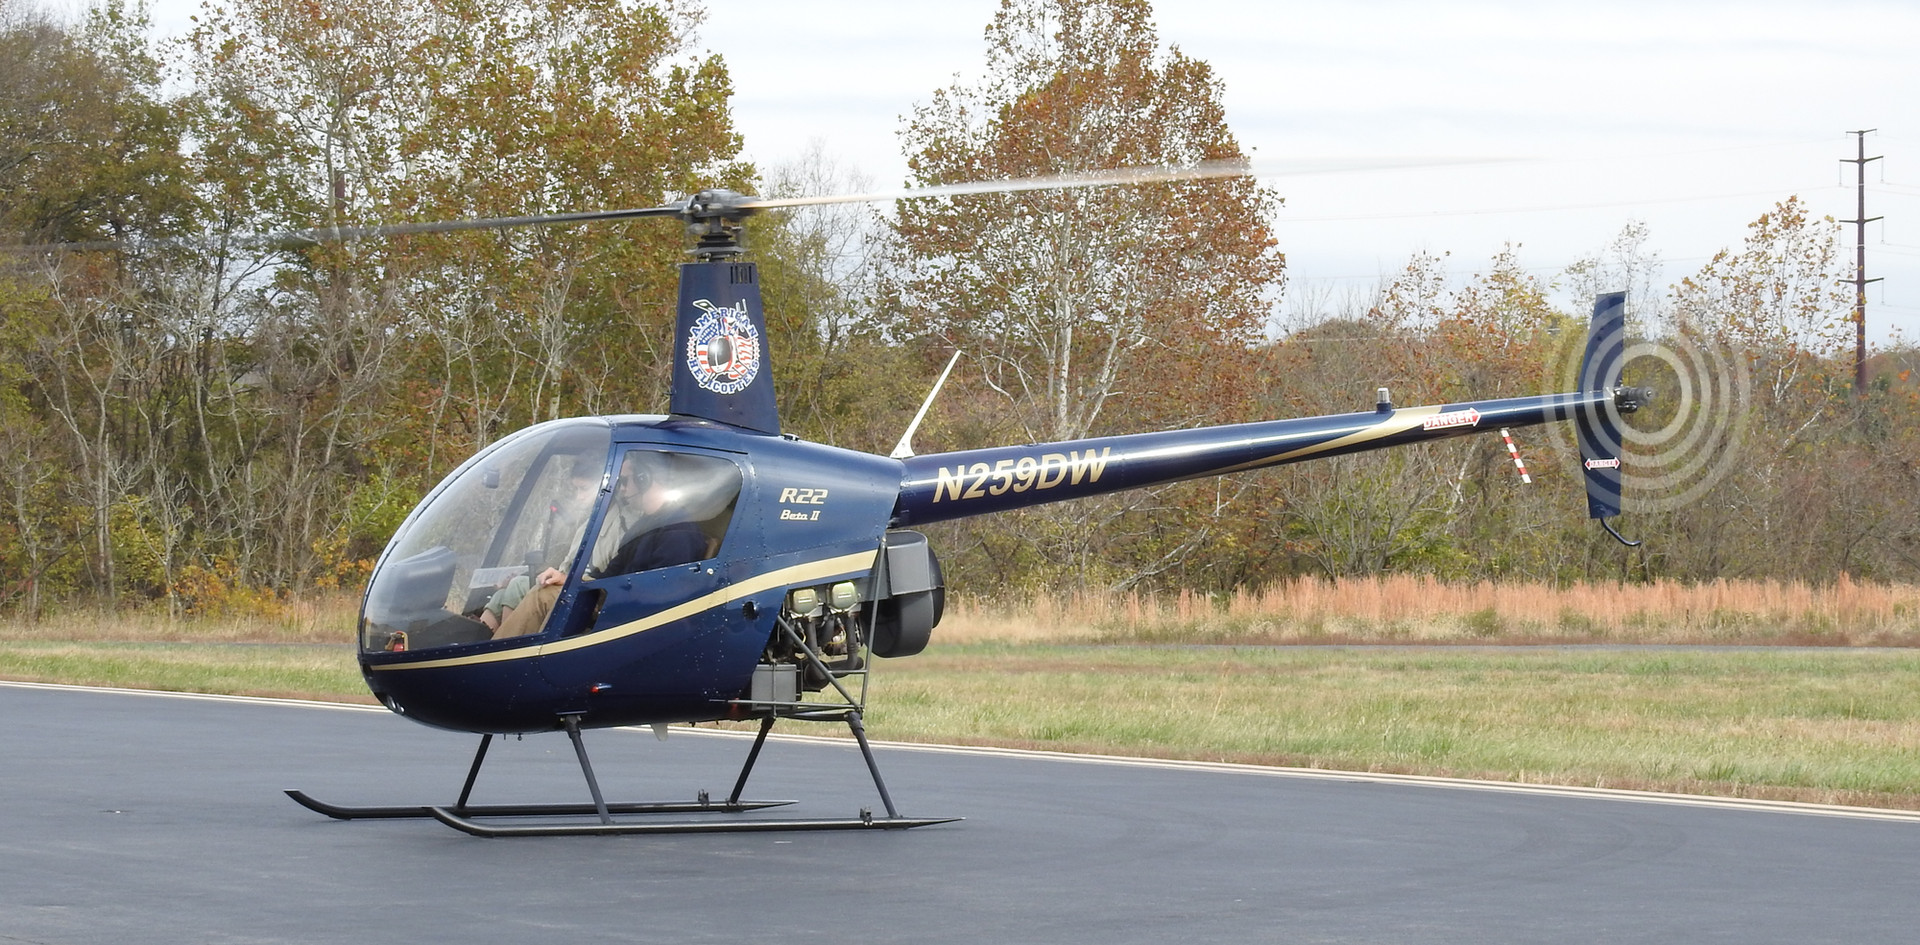 Robinson R-22 Beta II - $265/Hour